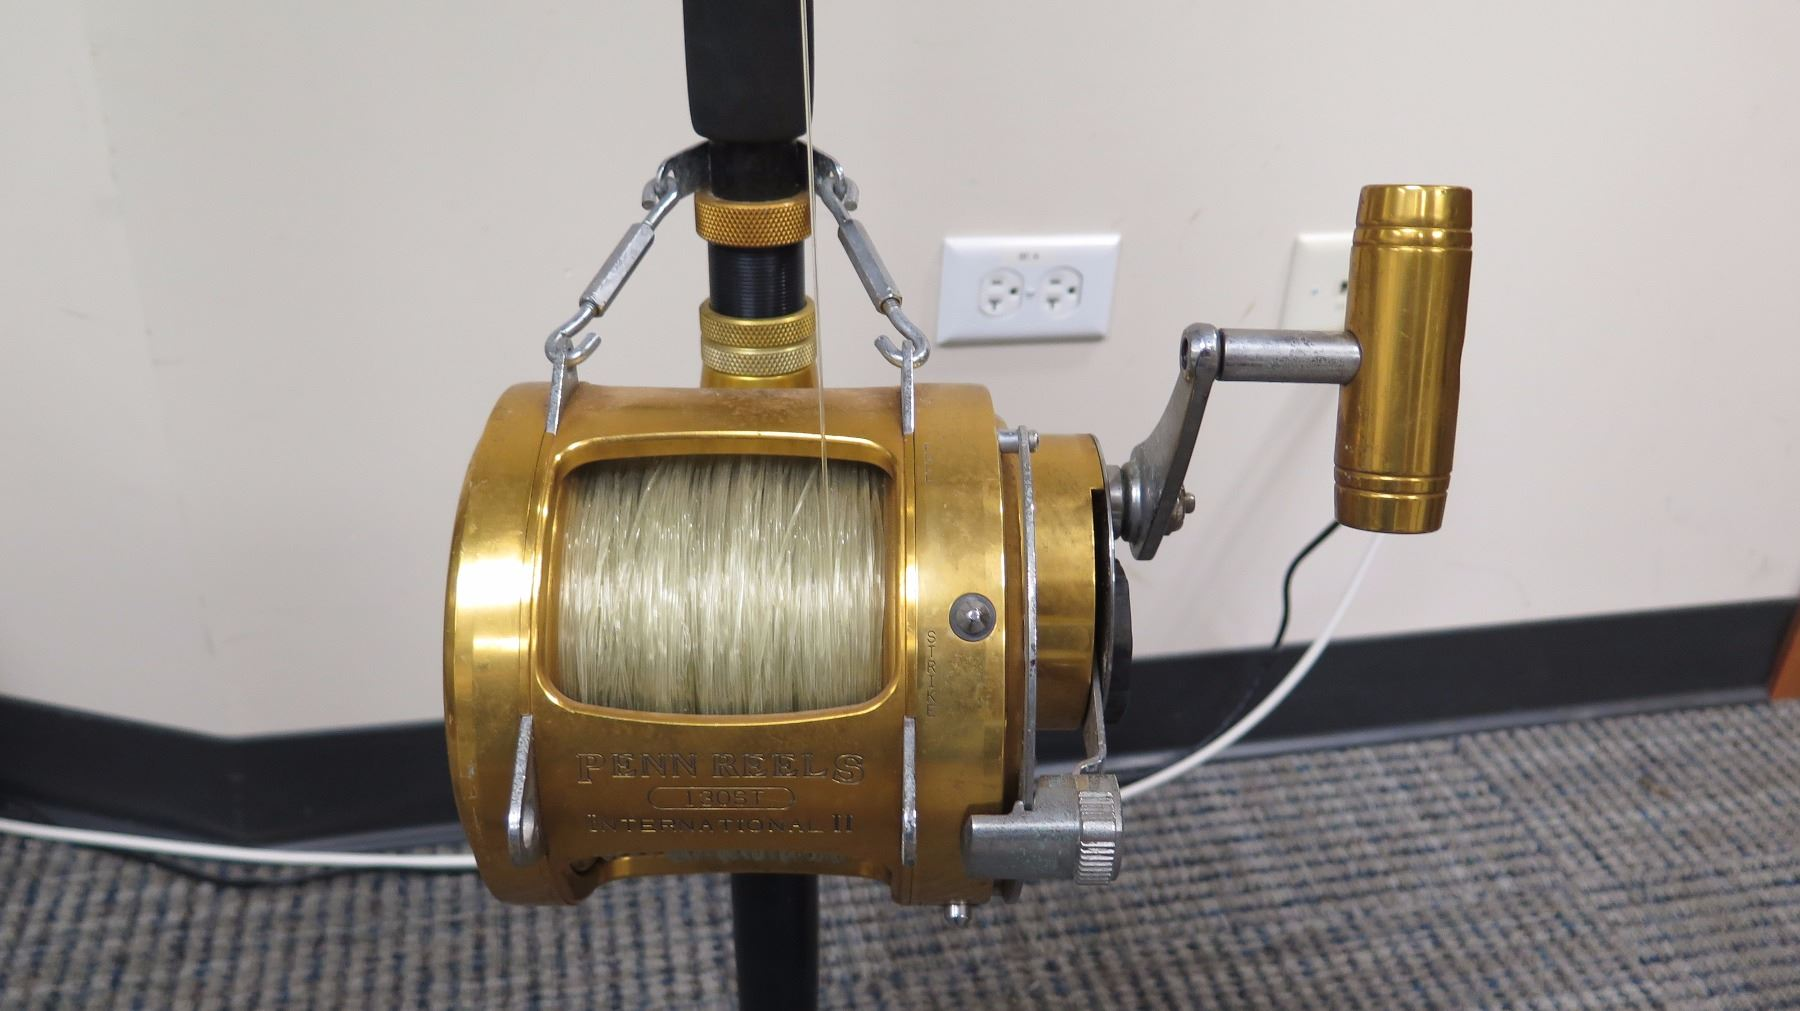 Fishing Rod (Anela) and Gold Reel (Penn Reels 130ST